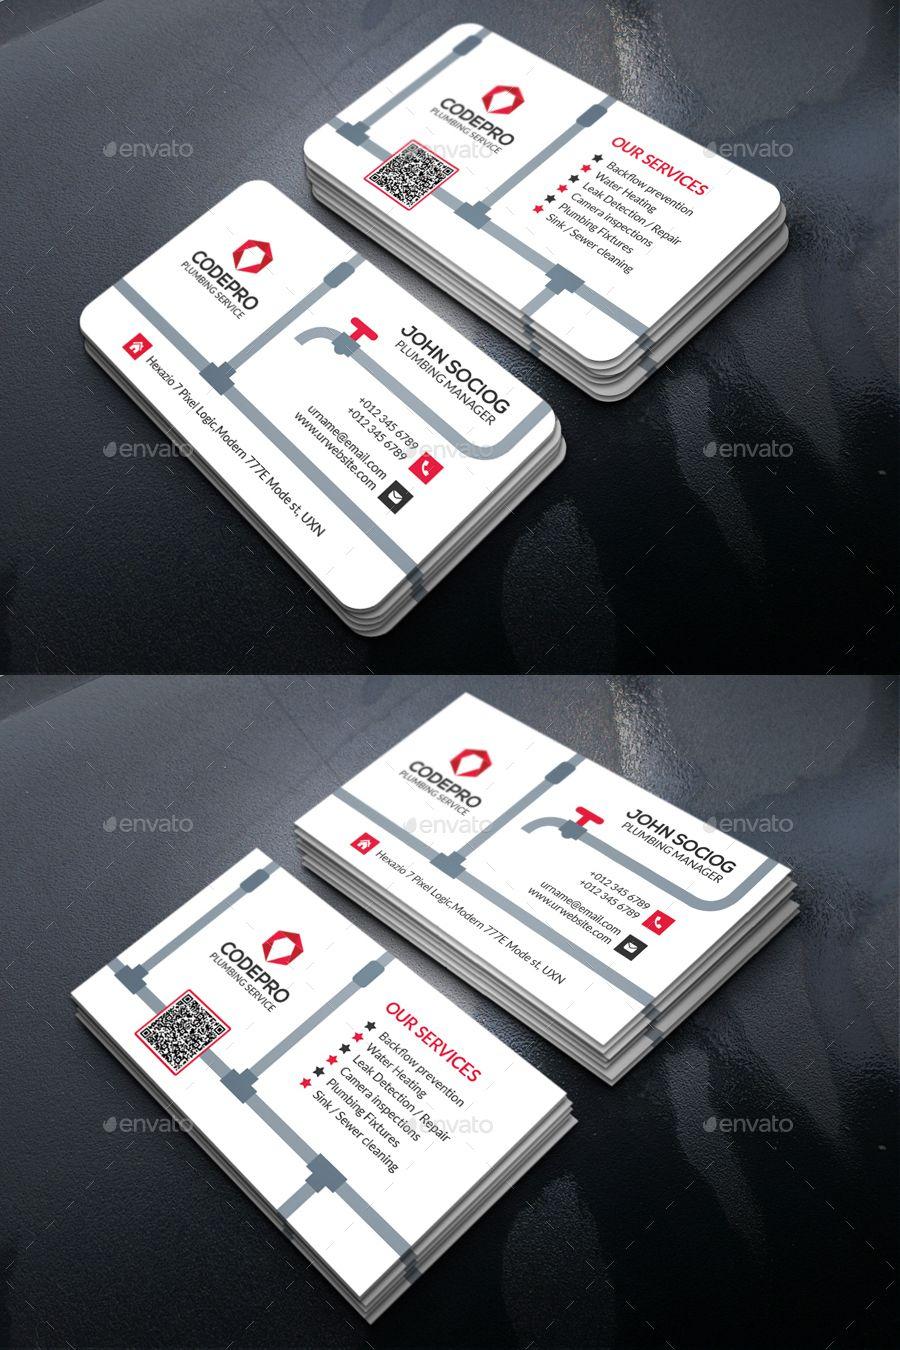 Plumbing Business Card Template Psd | Business Cards With Business Card Maker Template